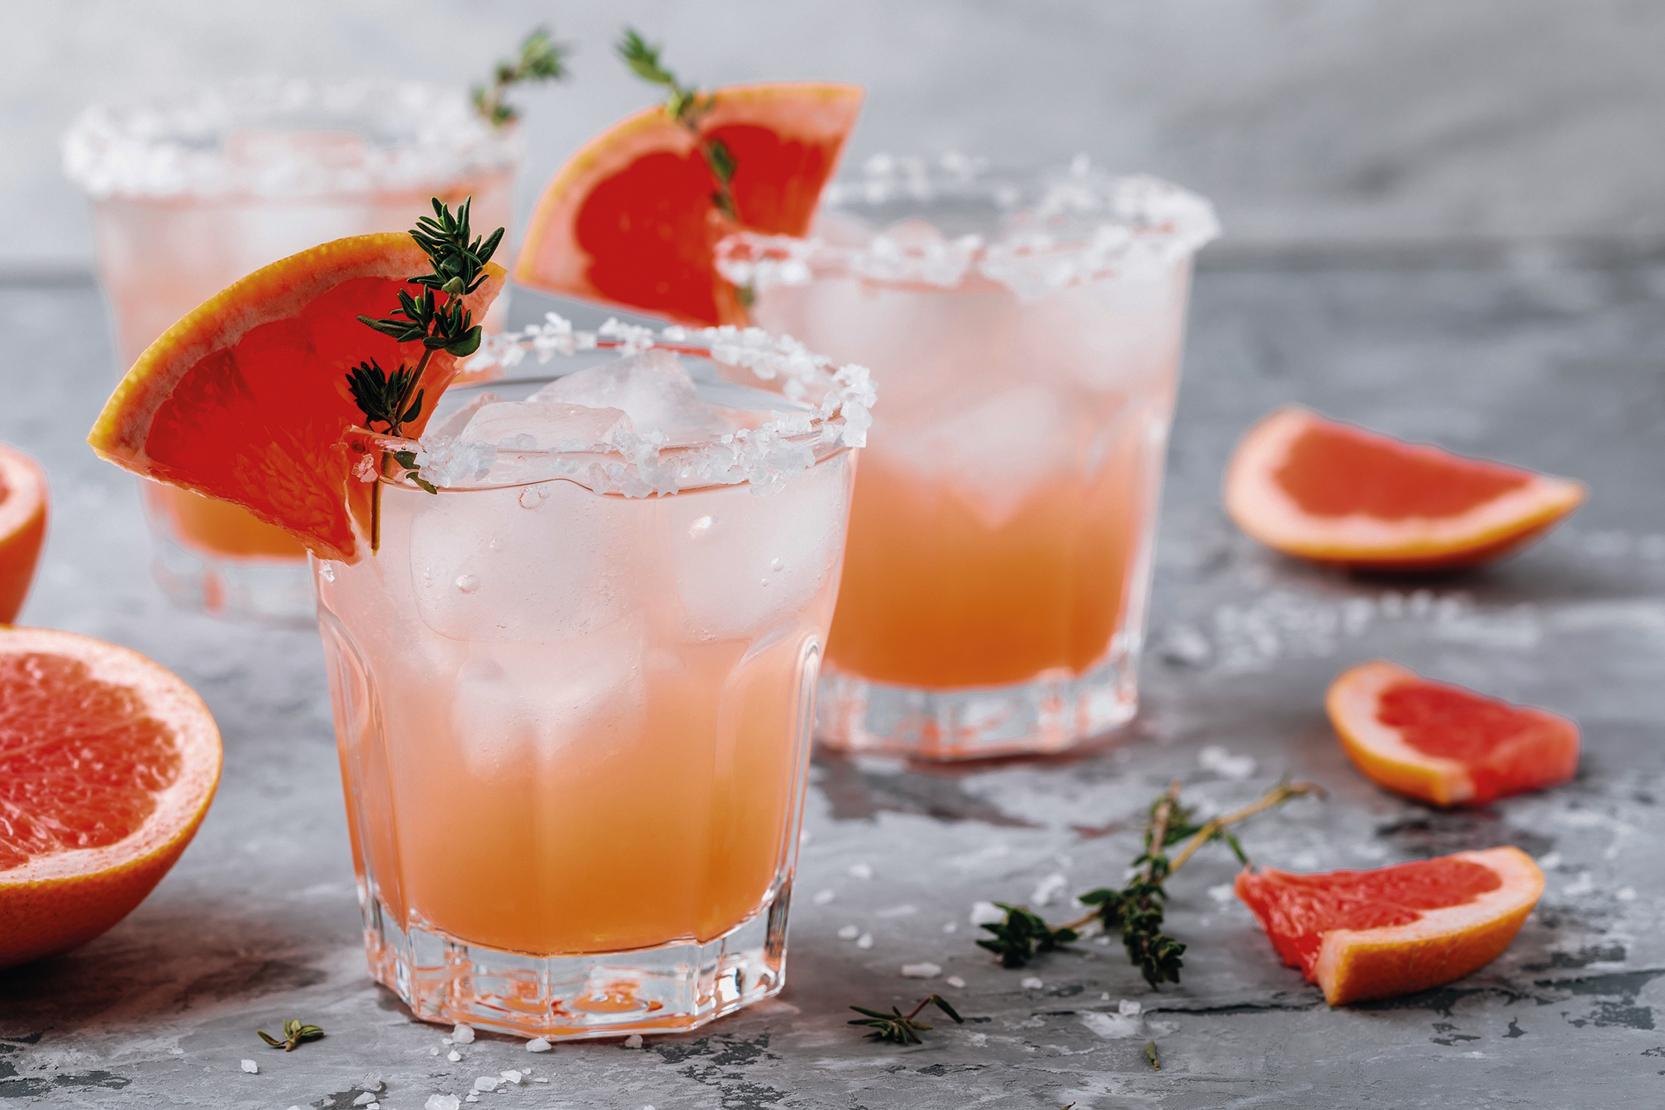 Gin cocktail Salty Dog with grapefruit juice and grapefruit wedge garnish